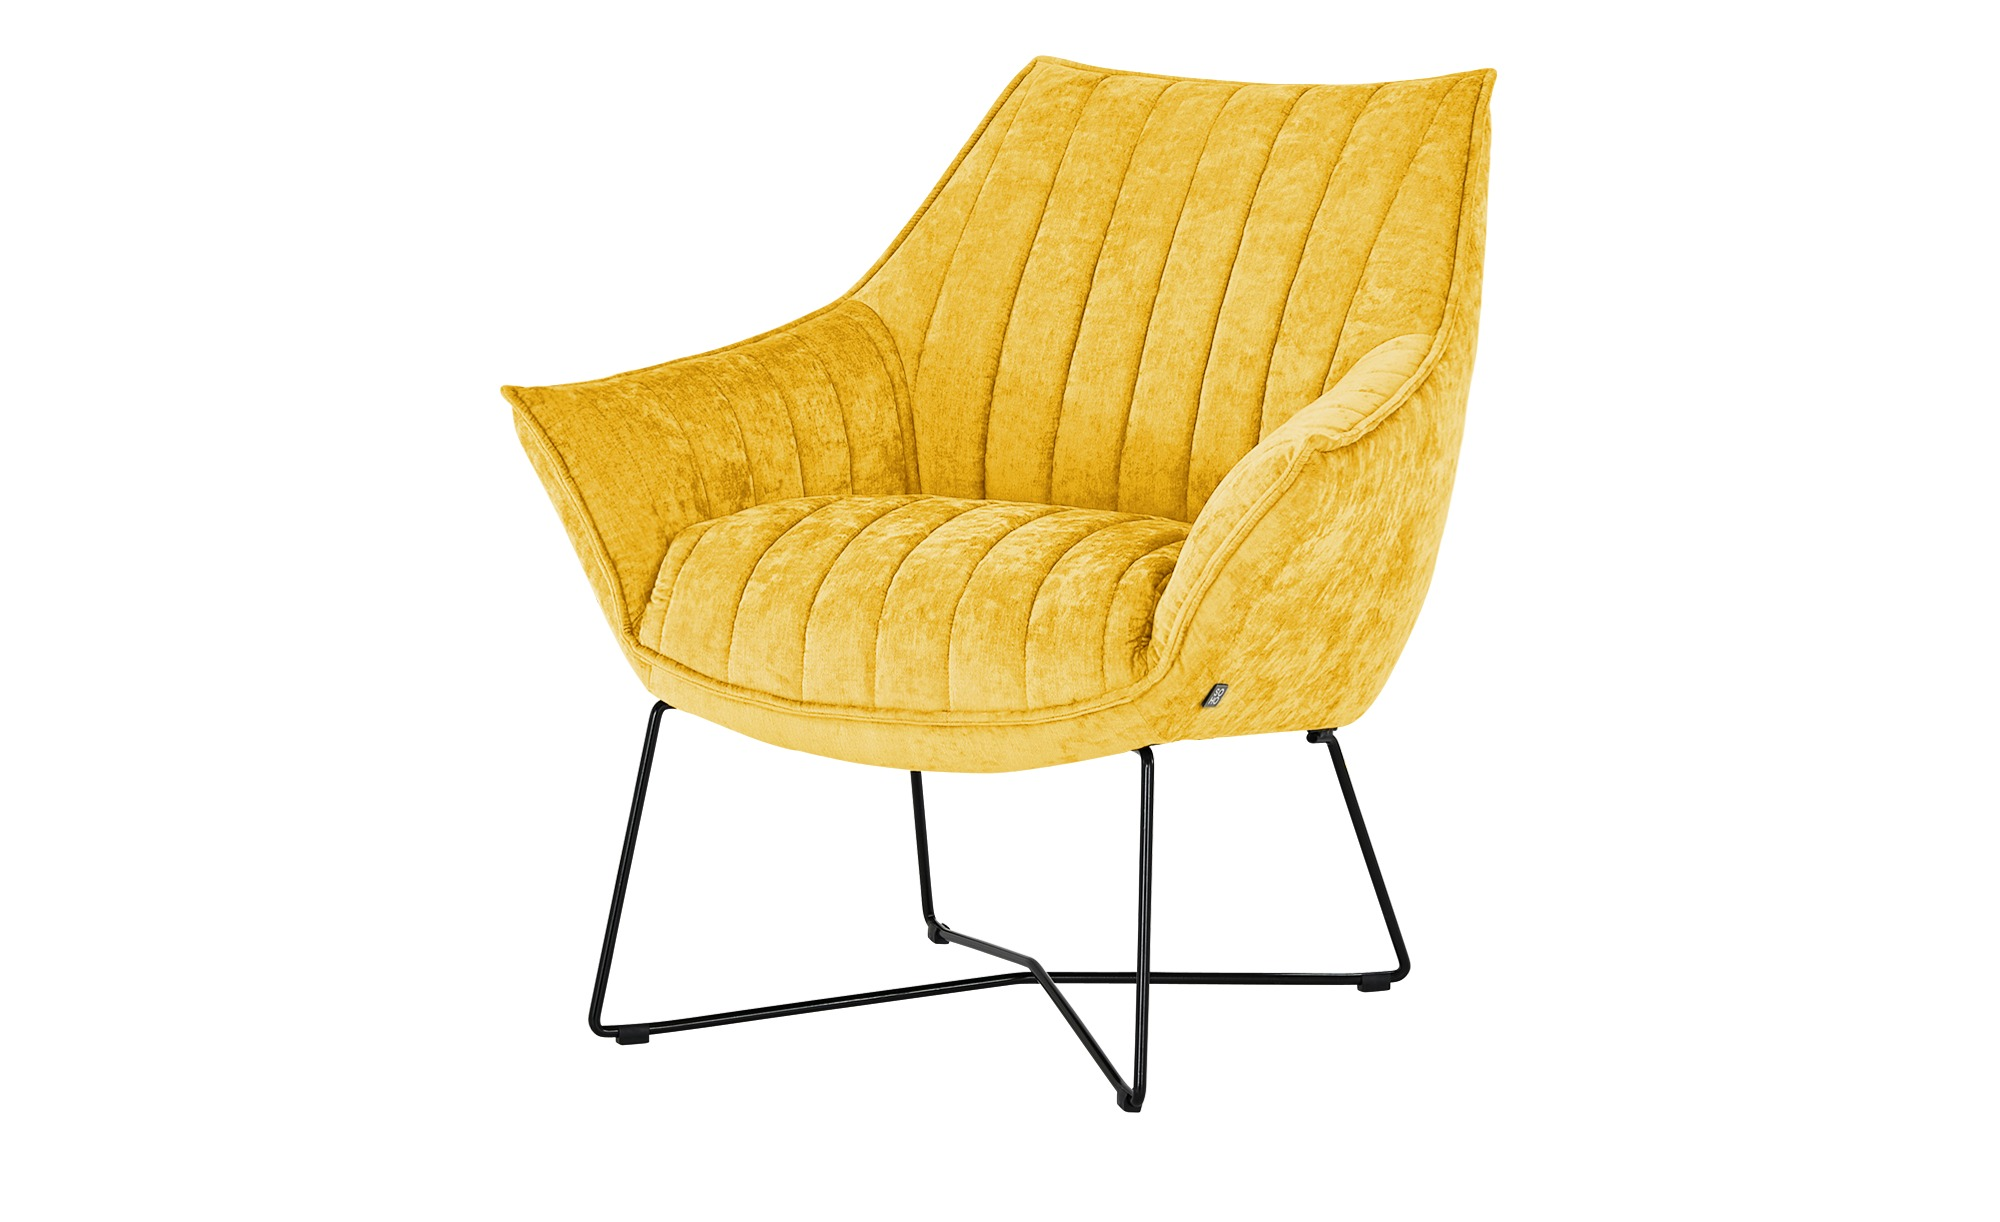 SOHO Sessel  Egeria ¦ gelb ¦ Maße (cm): B: 86 H: 80 T: 83 Polstermöbel > Sessel > Polstersessel - Höffner